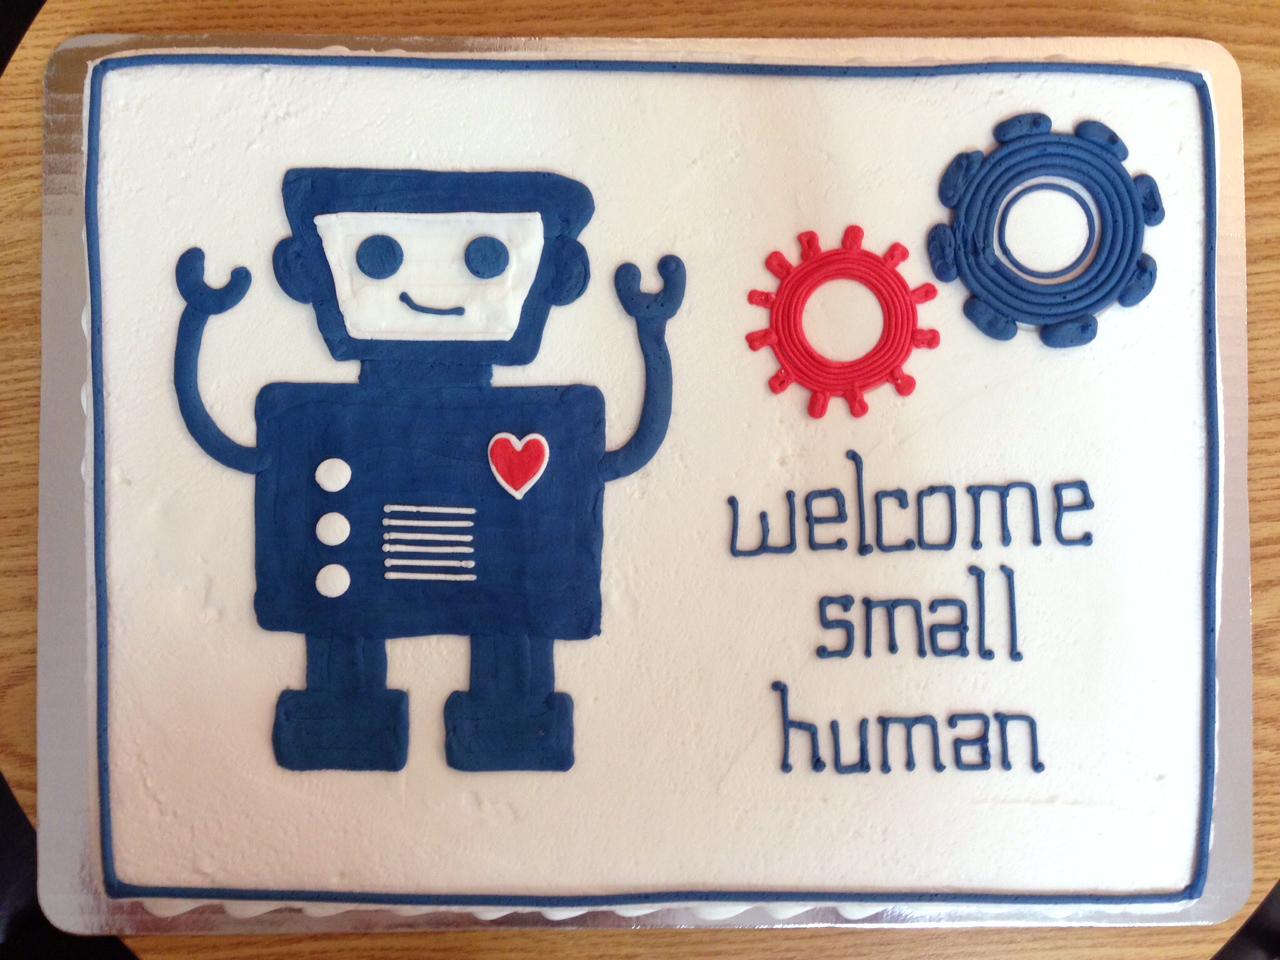 Welcome Small Human